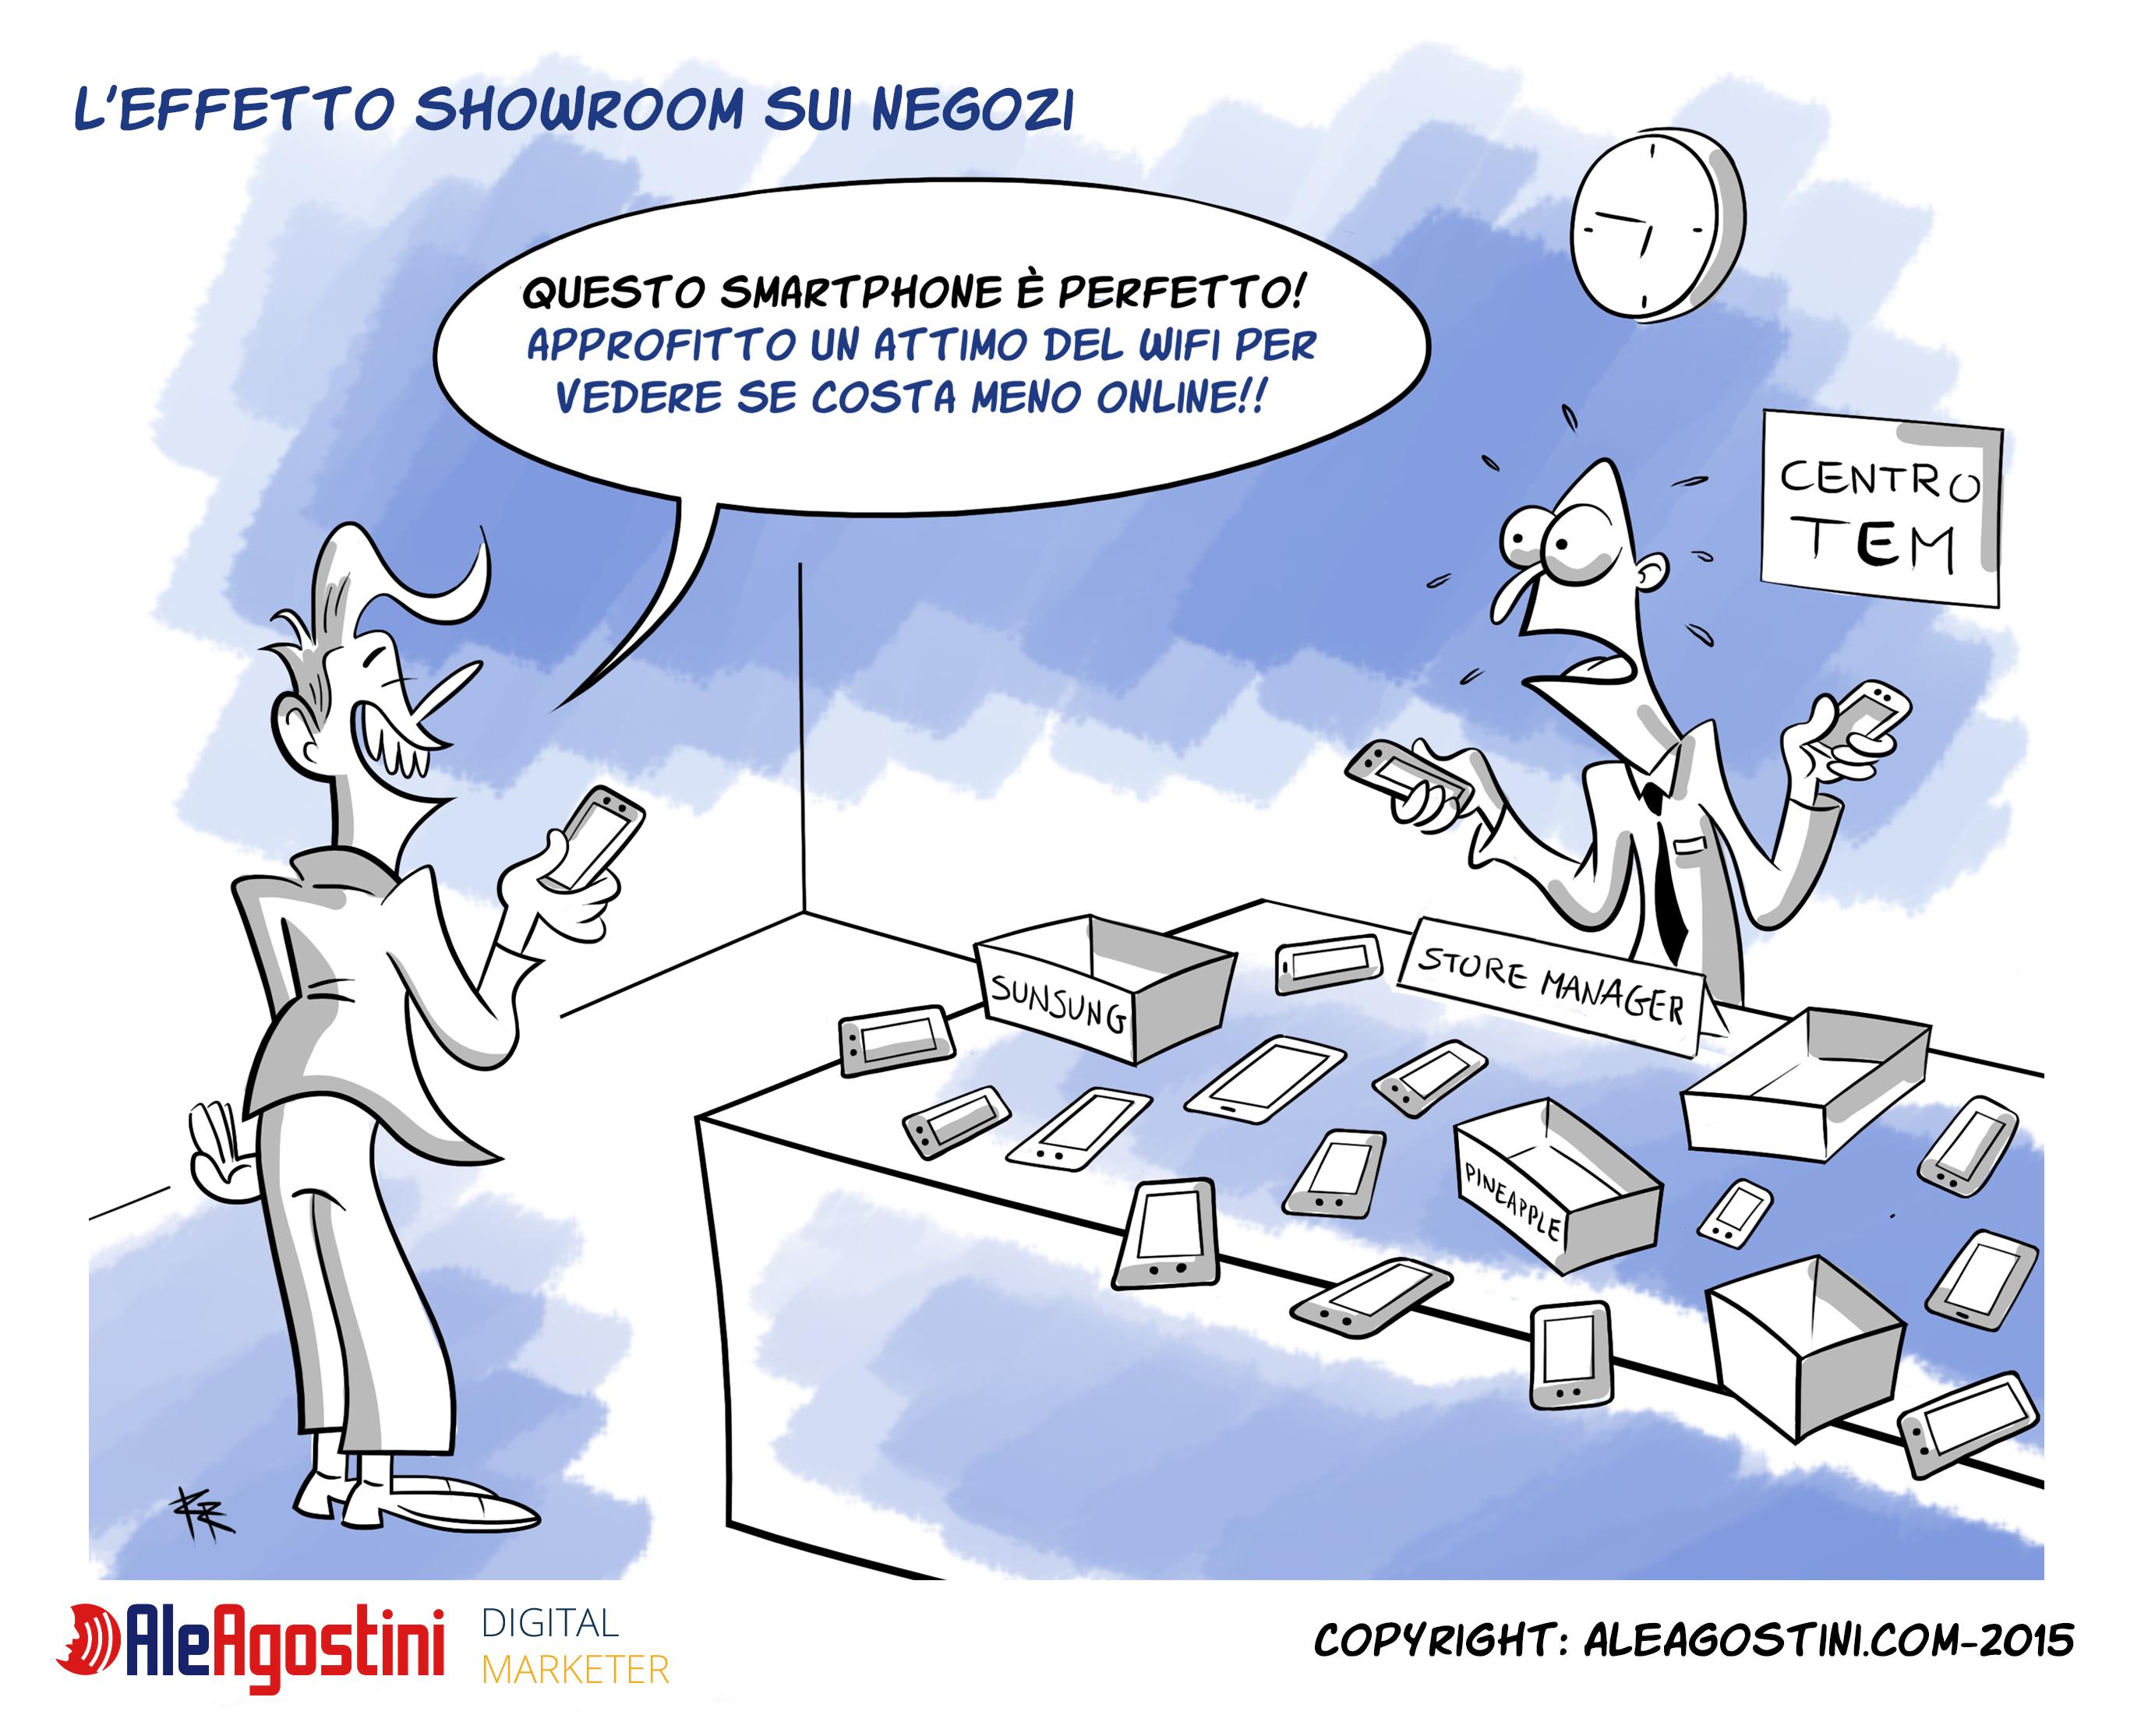 Effetto Showroom